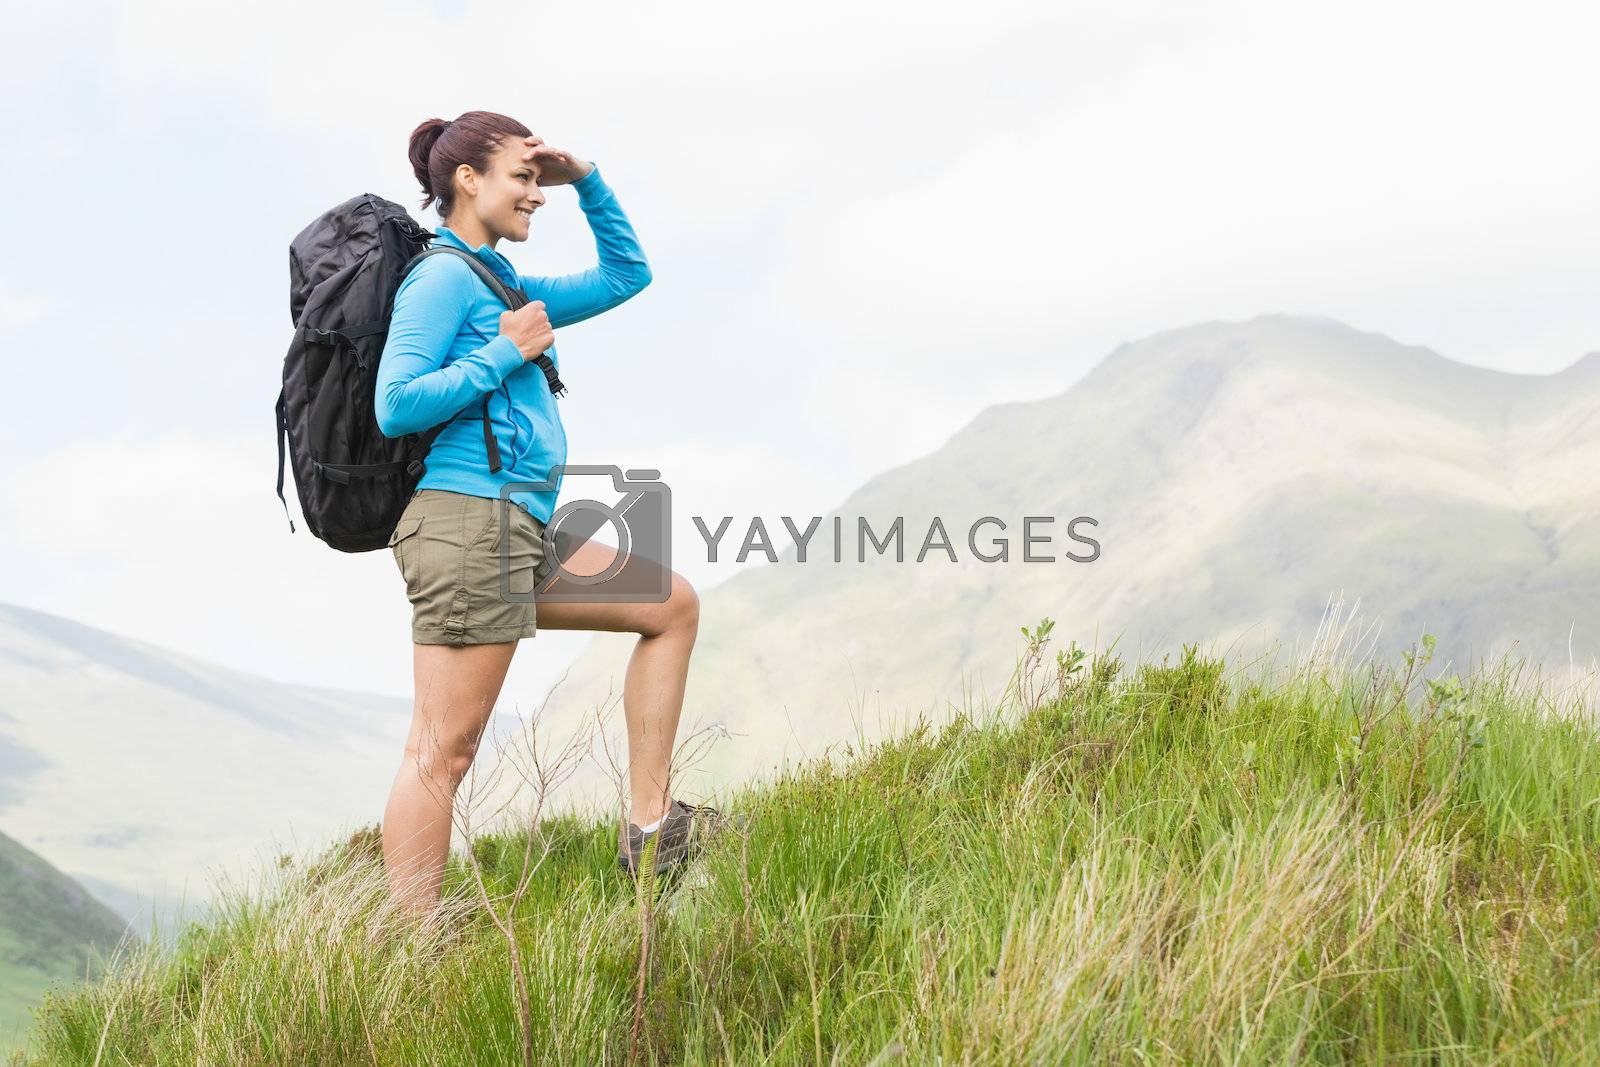 Pretty hiker with backpack walking uphill by Wavebreakmedia